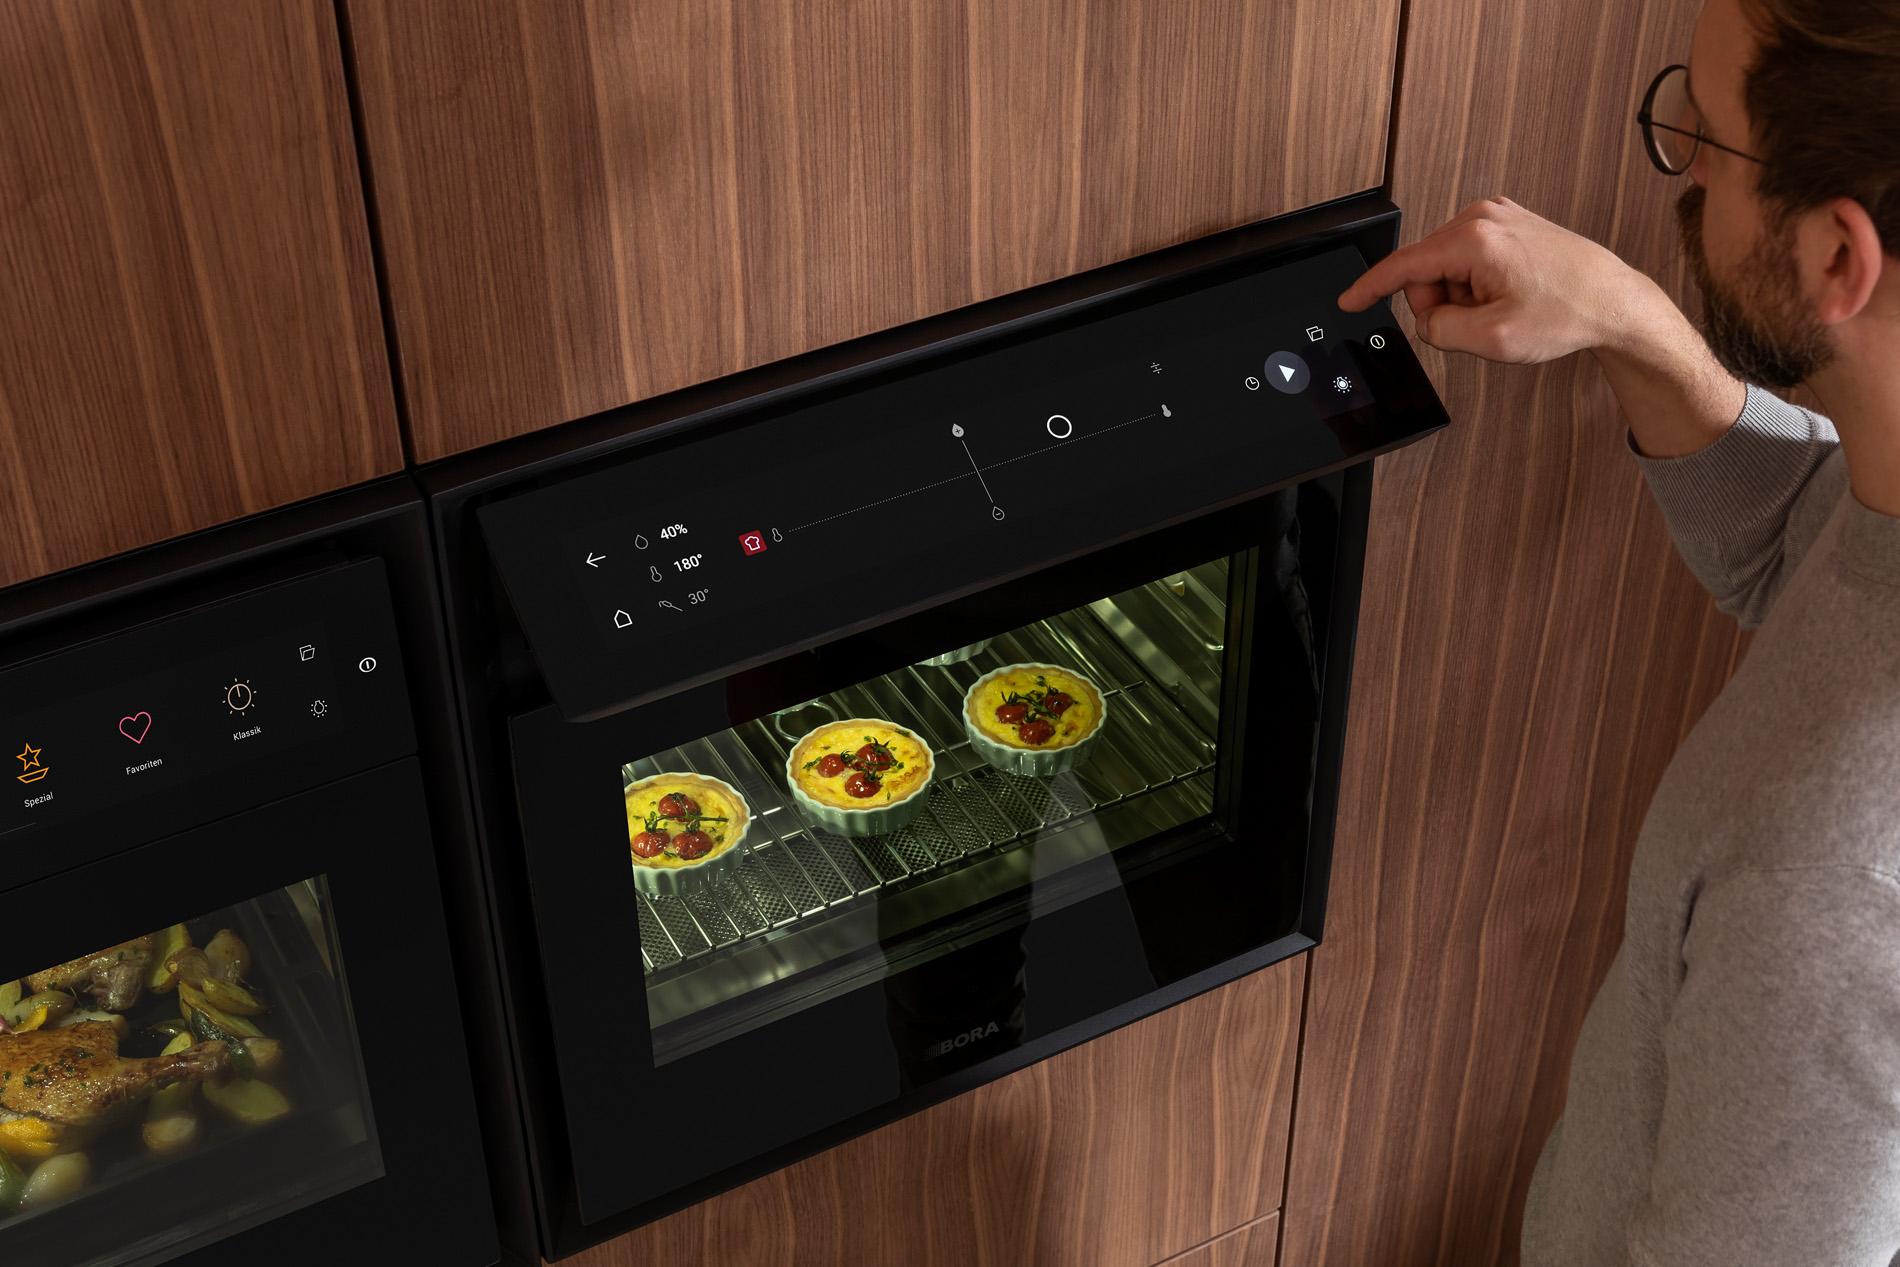 BORA X BO luxe oven met flexibel display, Keukenapparatuur ASWA Keukens